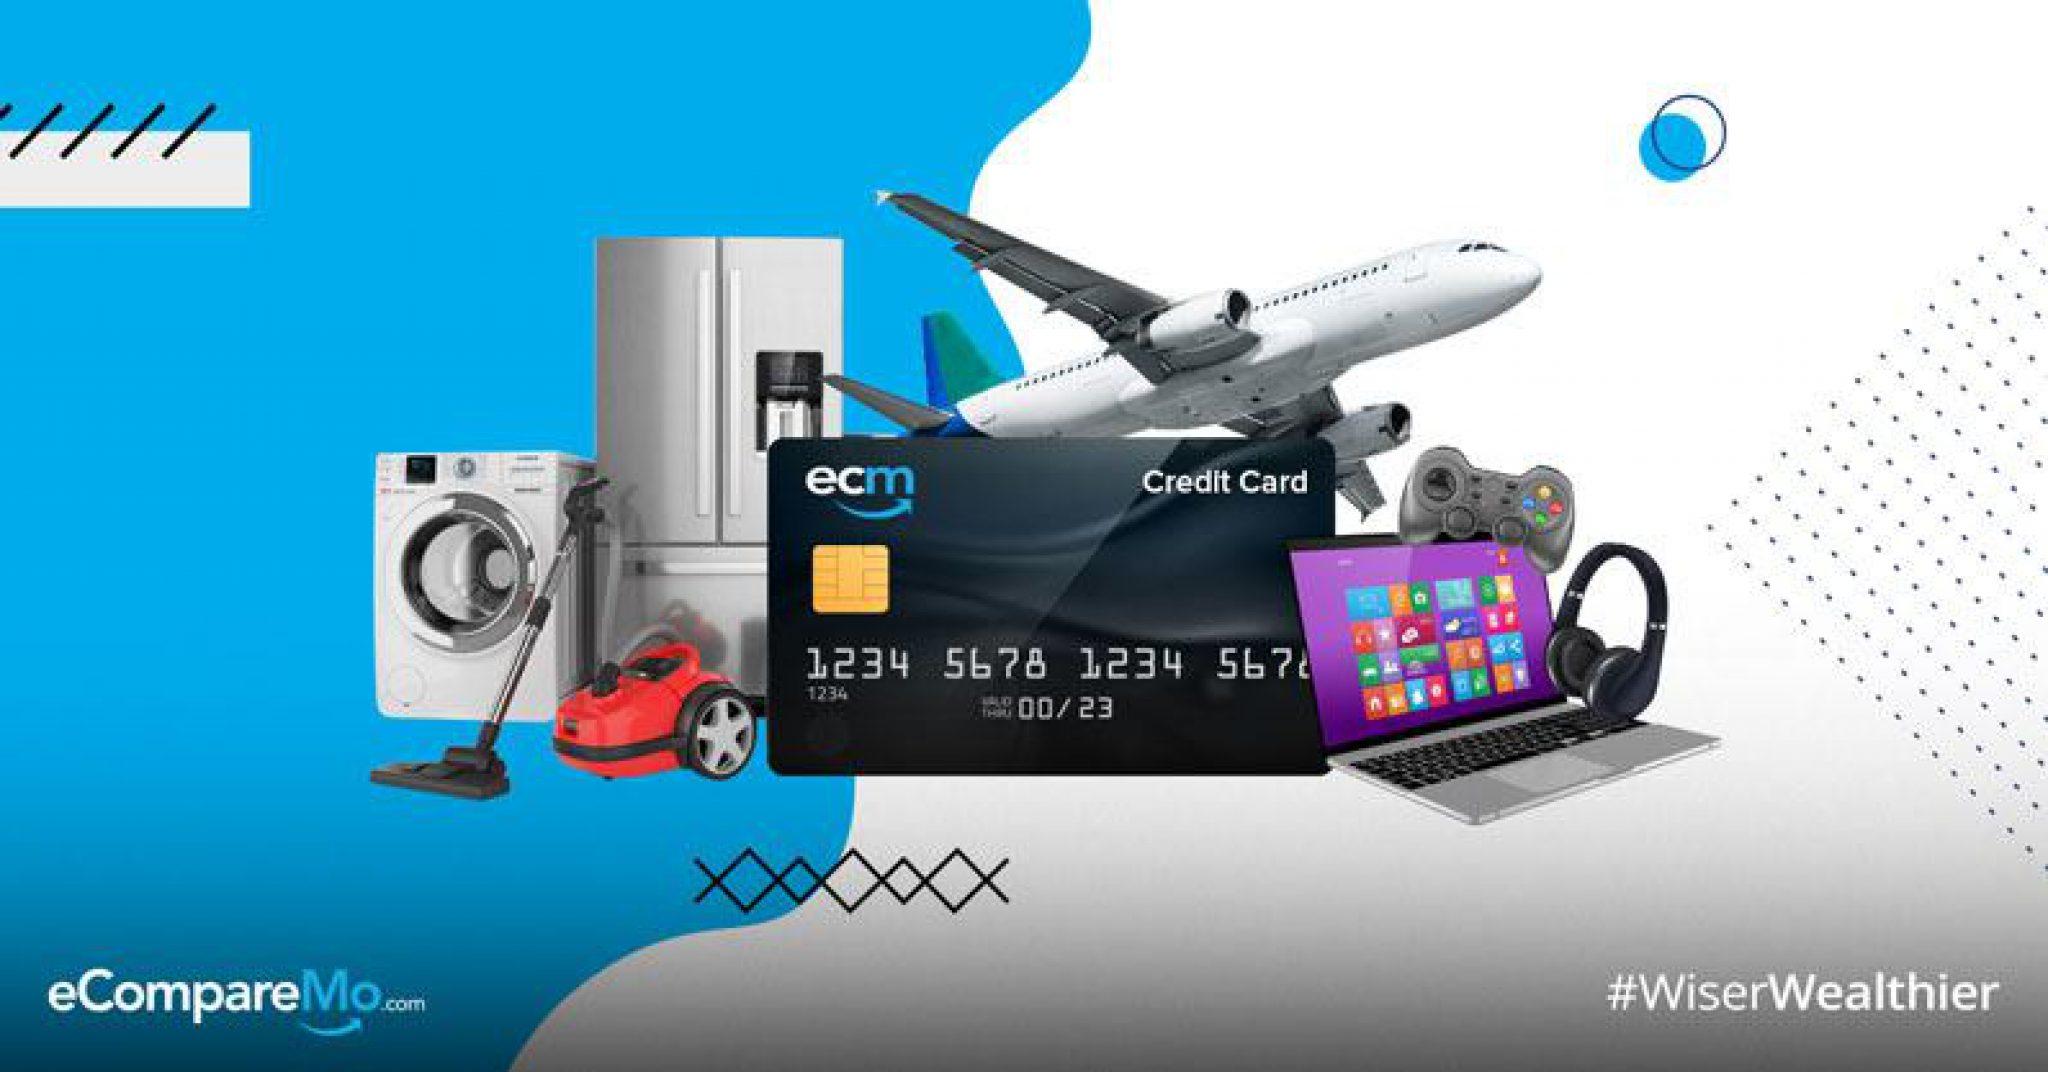 Credit Card Promos September 2019